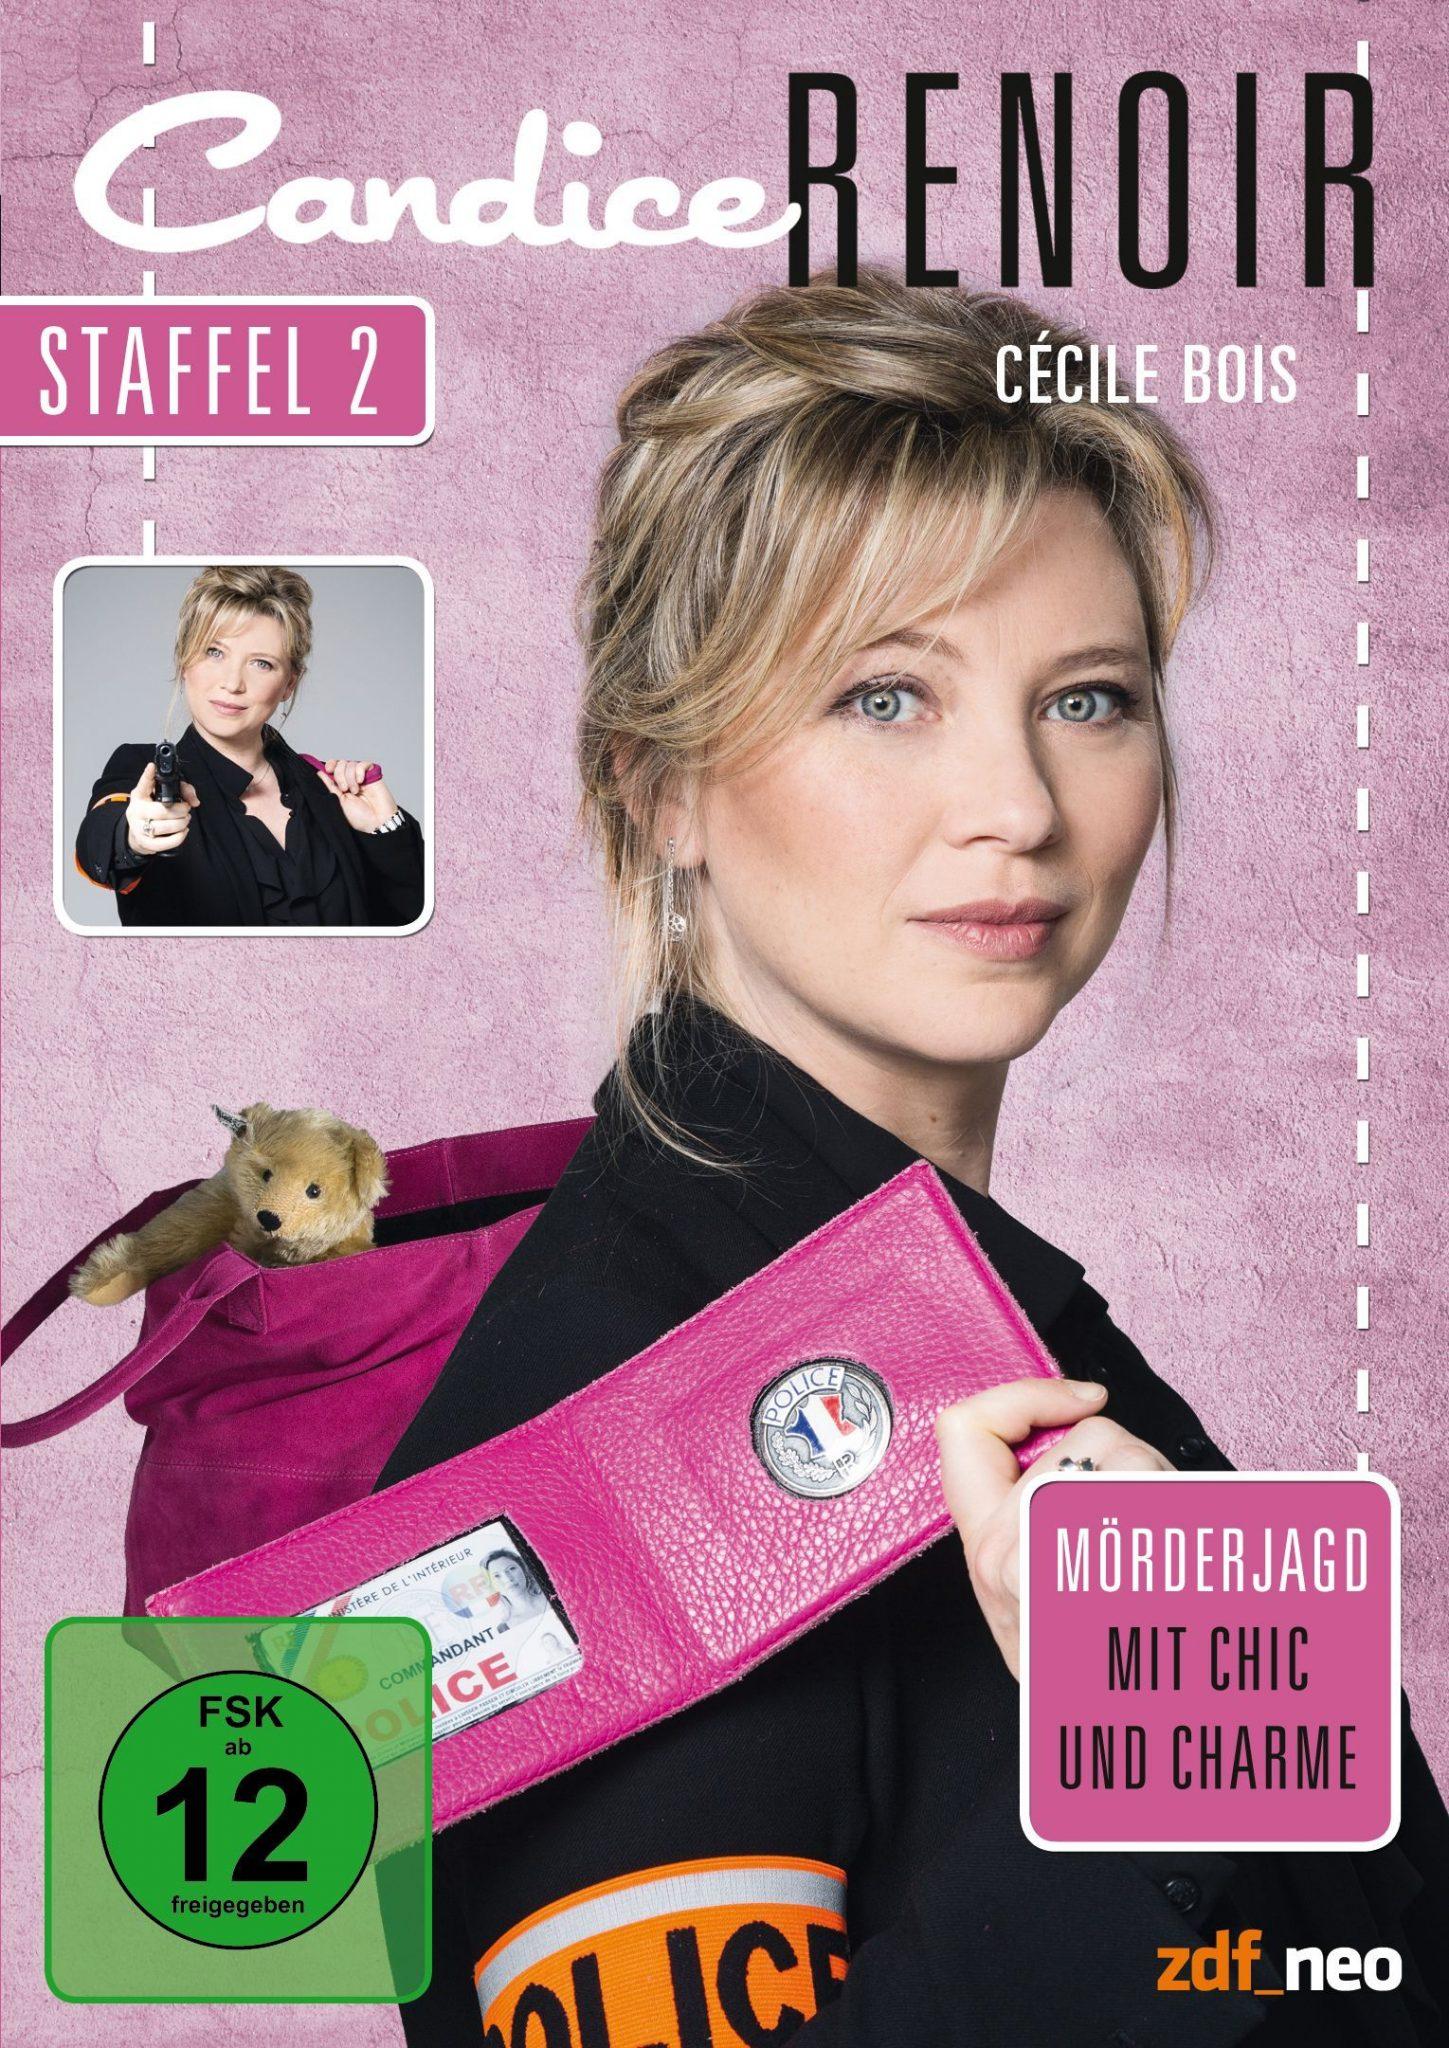 """Candice Renoir (Staffel II)"" | Echte Leute"